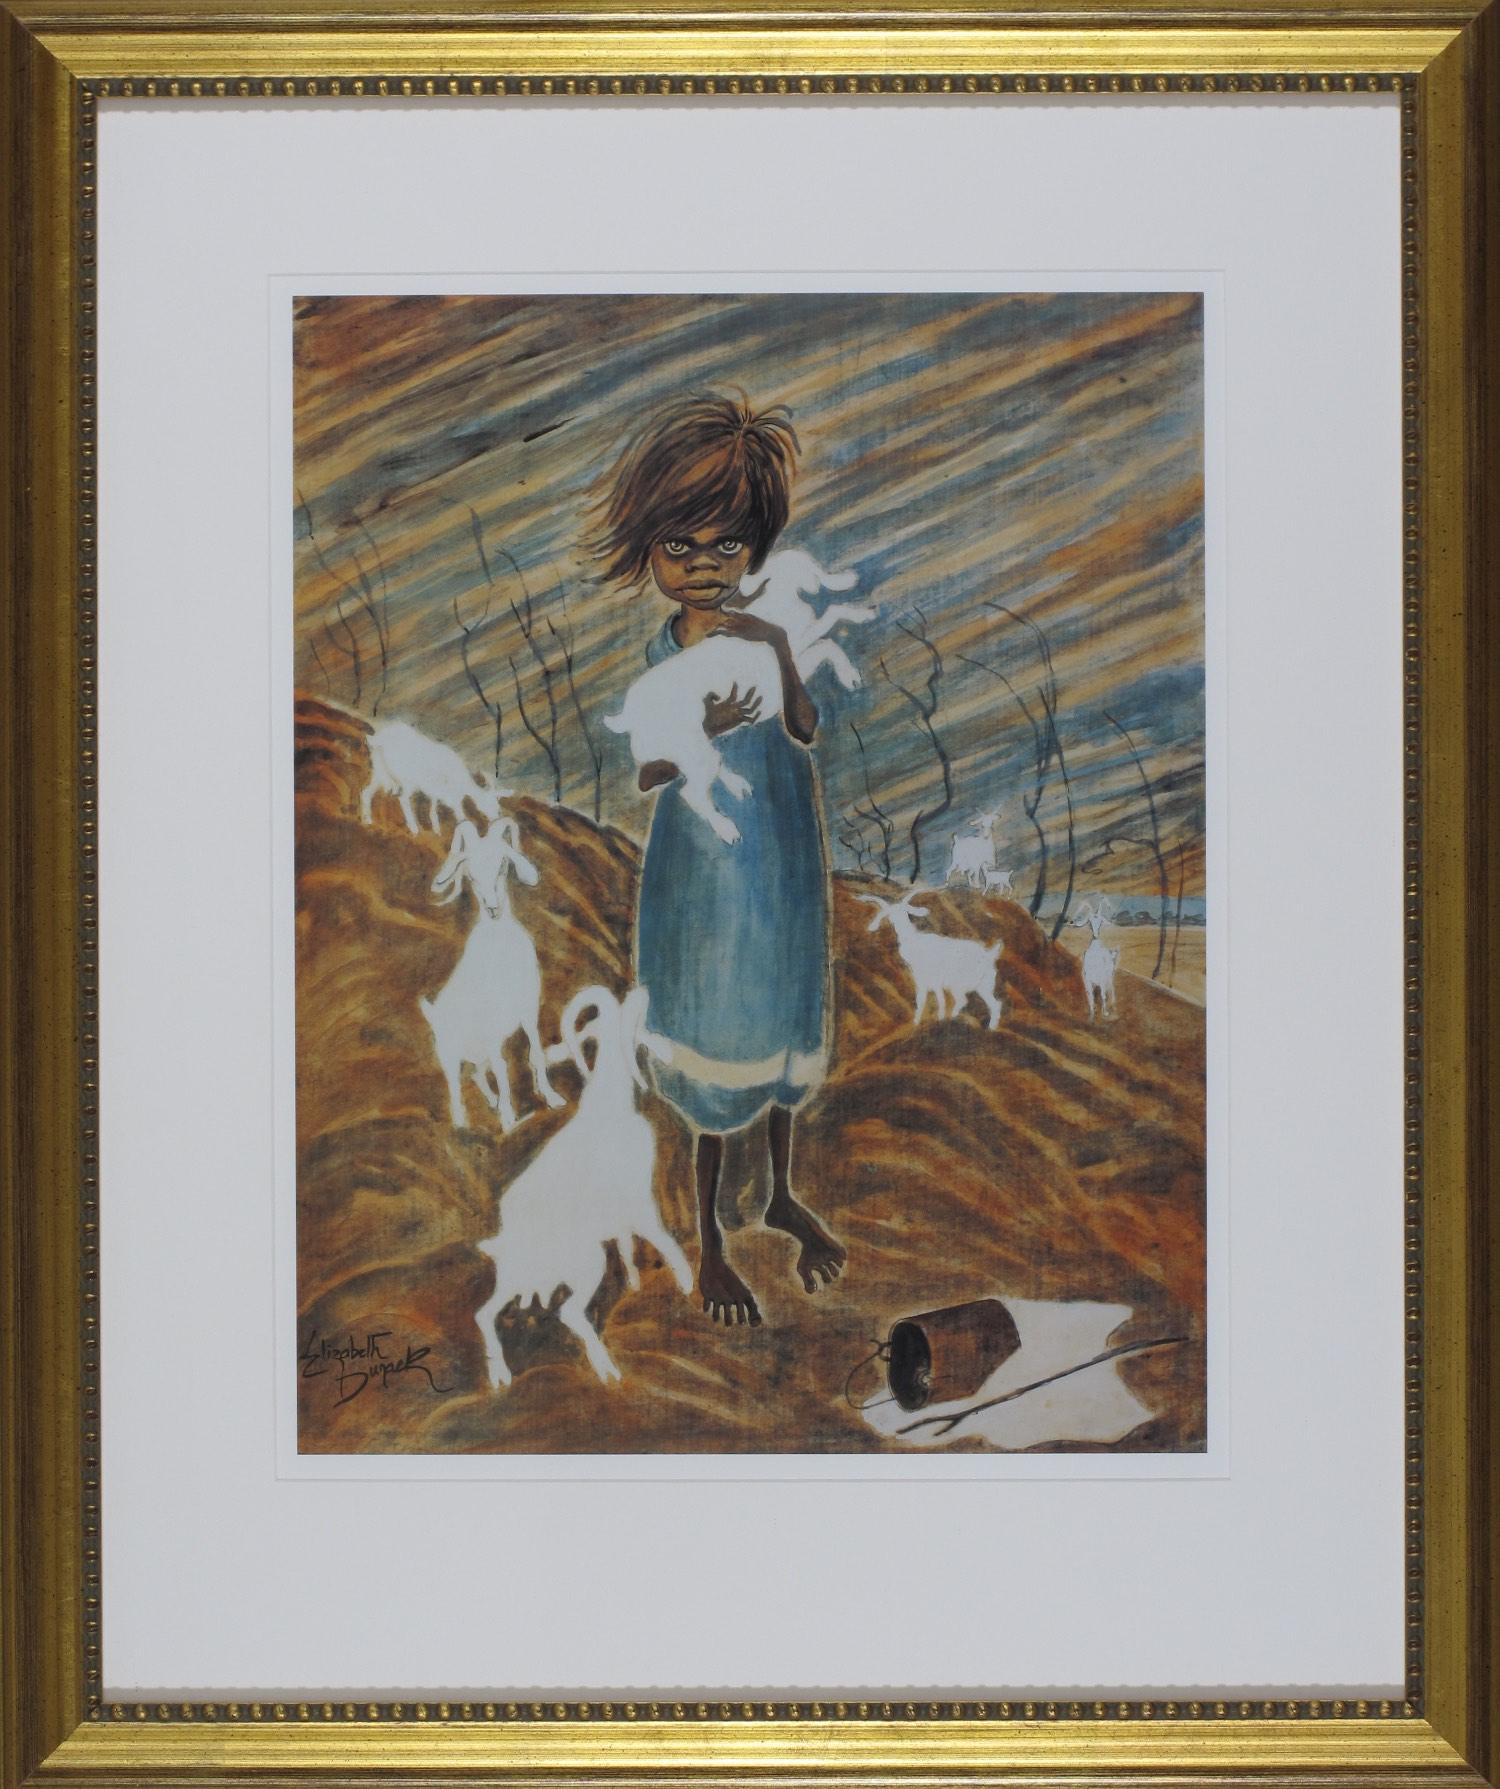 Elizabeth Durack. The Kid. 78cm x 65cm #9404